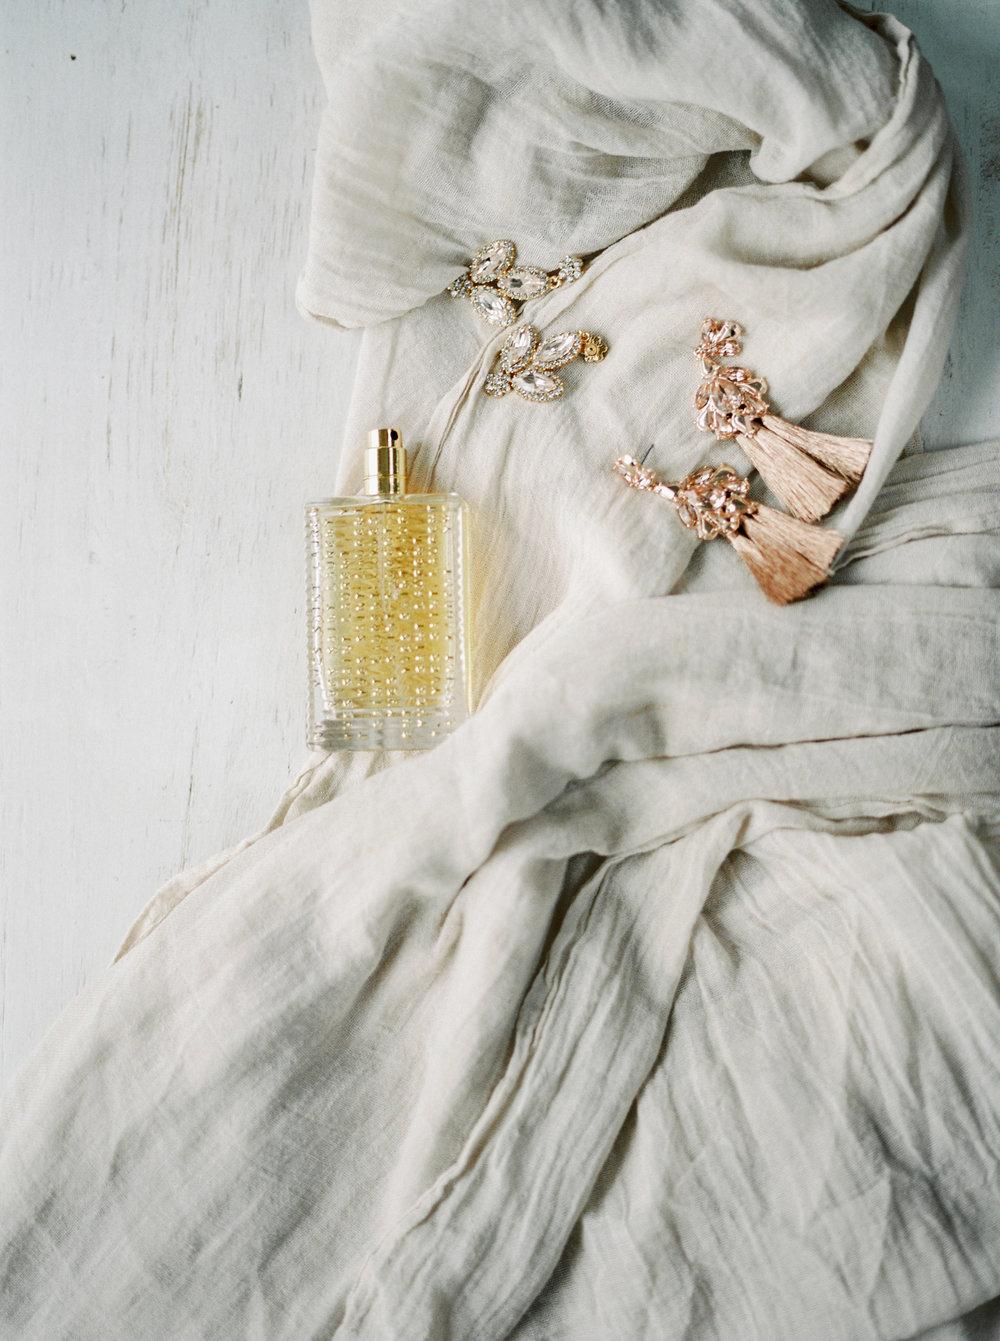 Luxury Wedding Planner UK | Our Chic & Romantic Engagement Shoot in Bath | Katie Julia Photography - 106.JPG